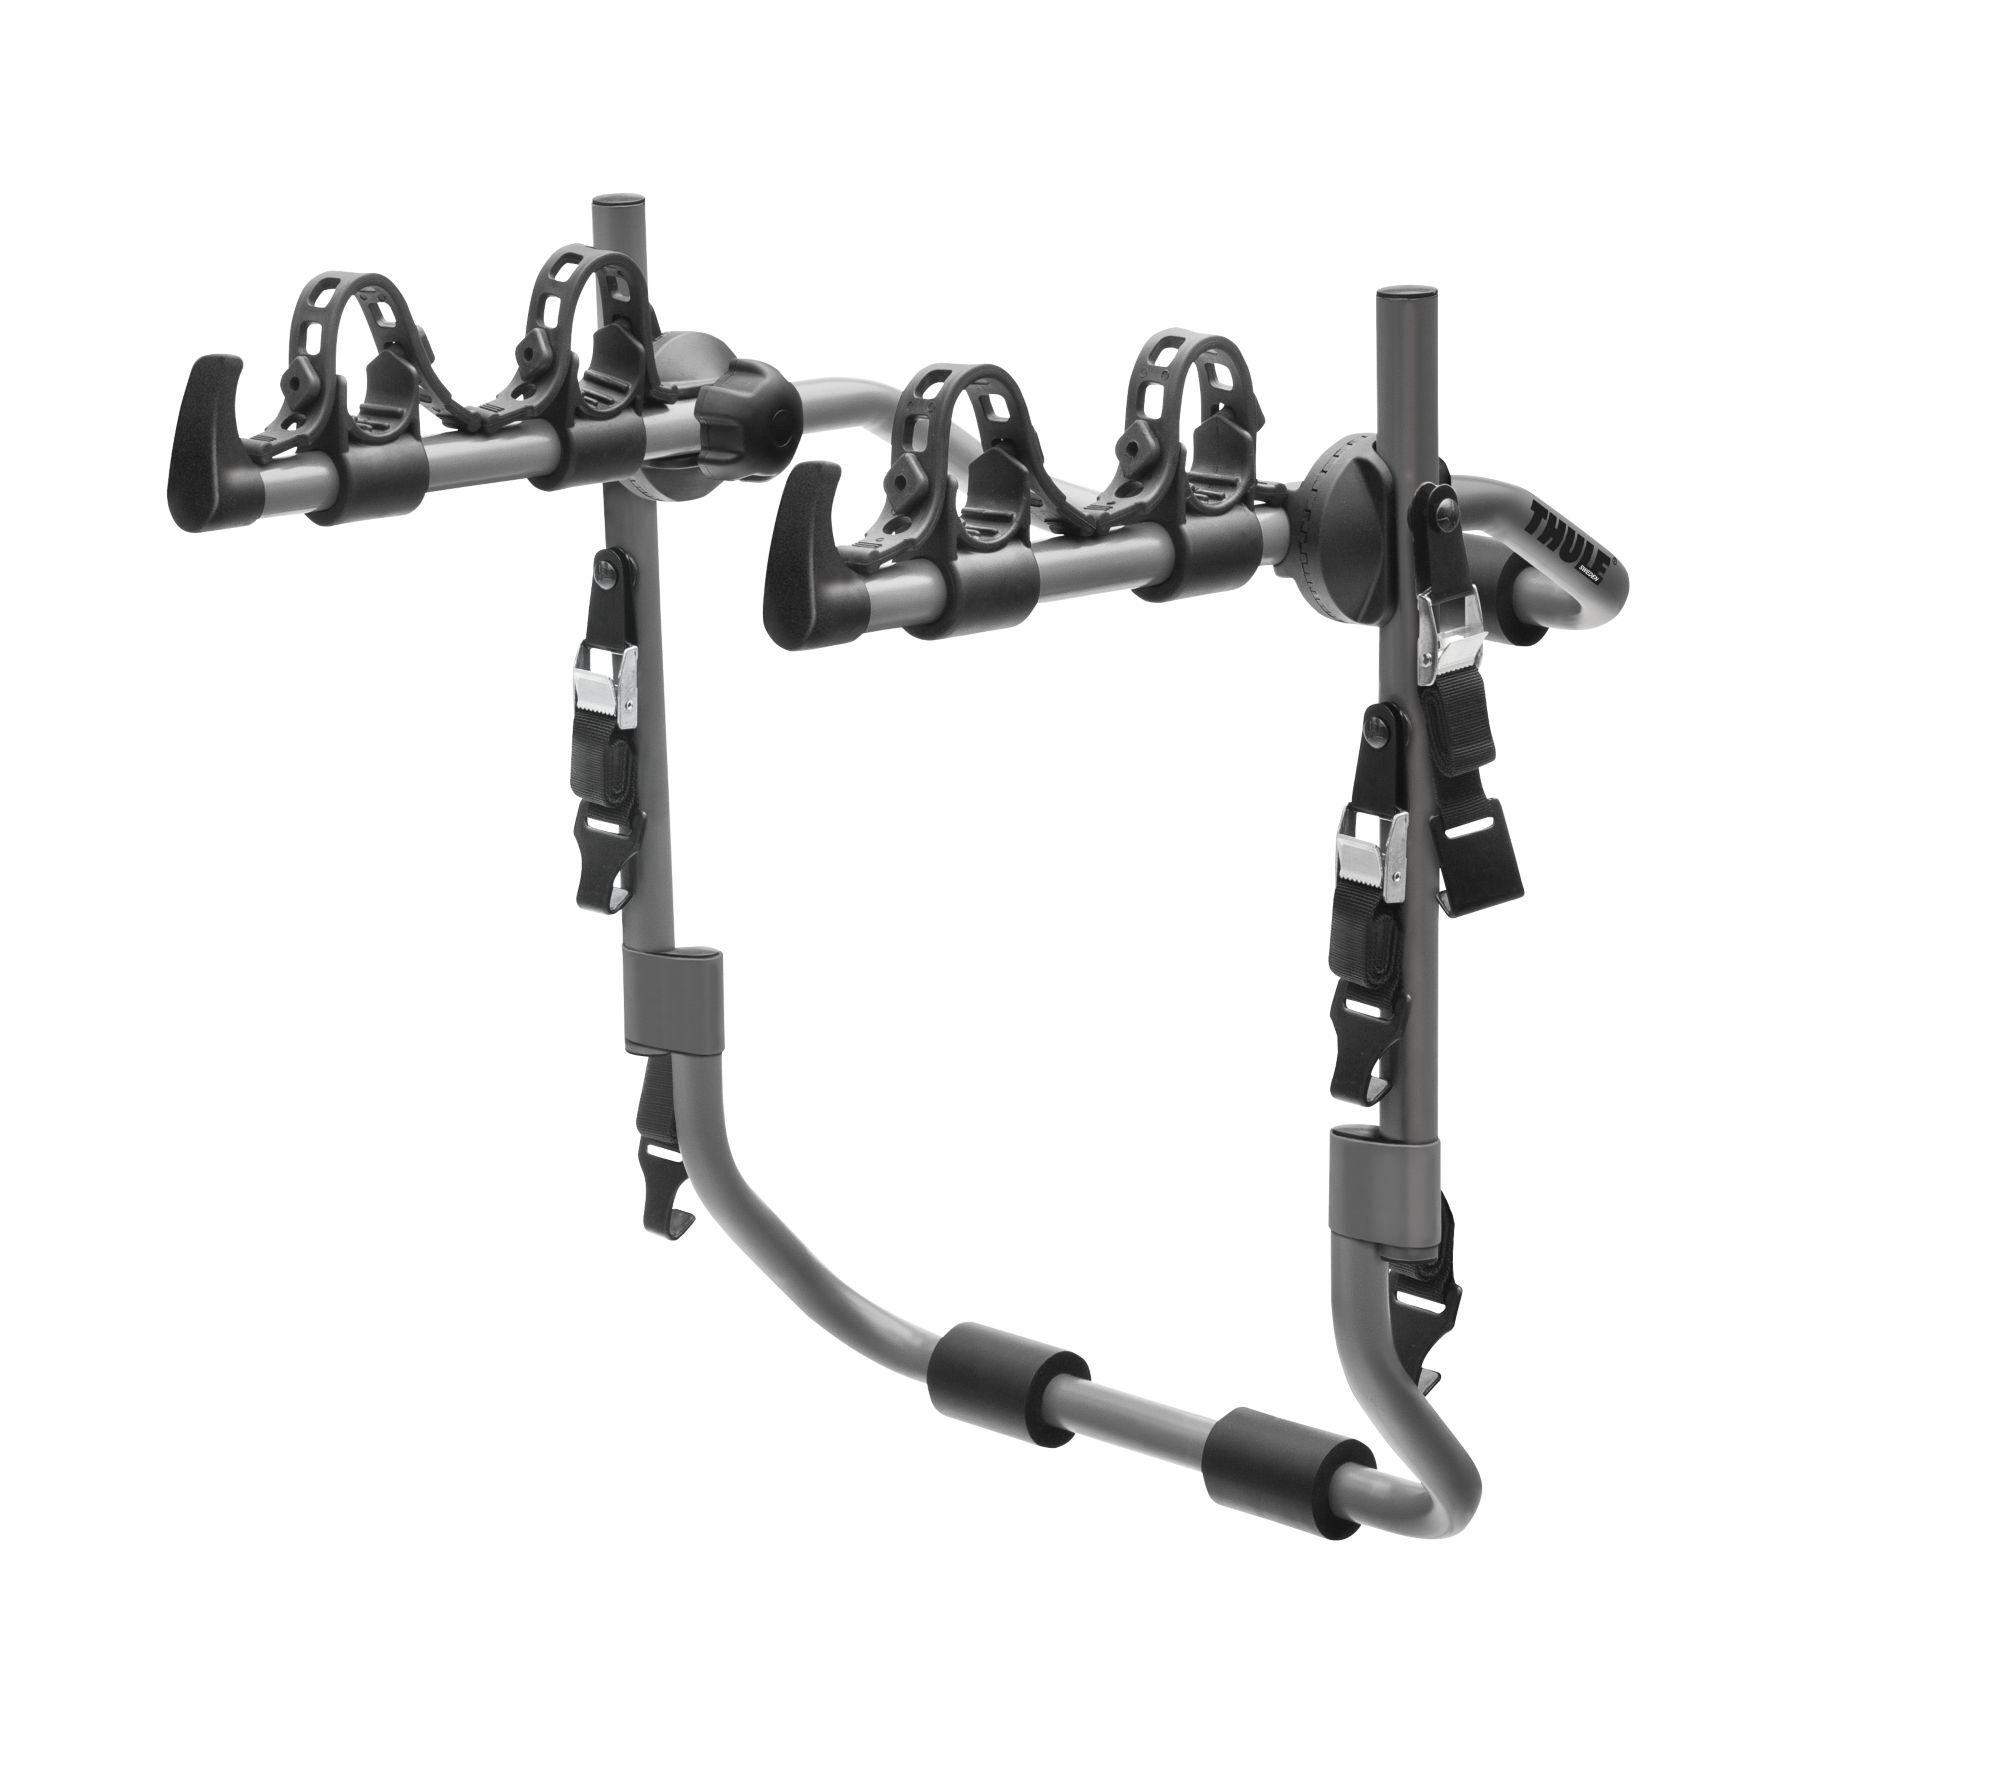 Thule Tempo Trunk Mount 2-Bike Rack